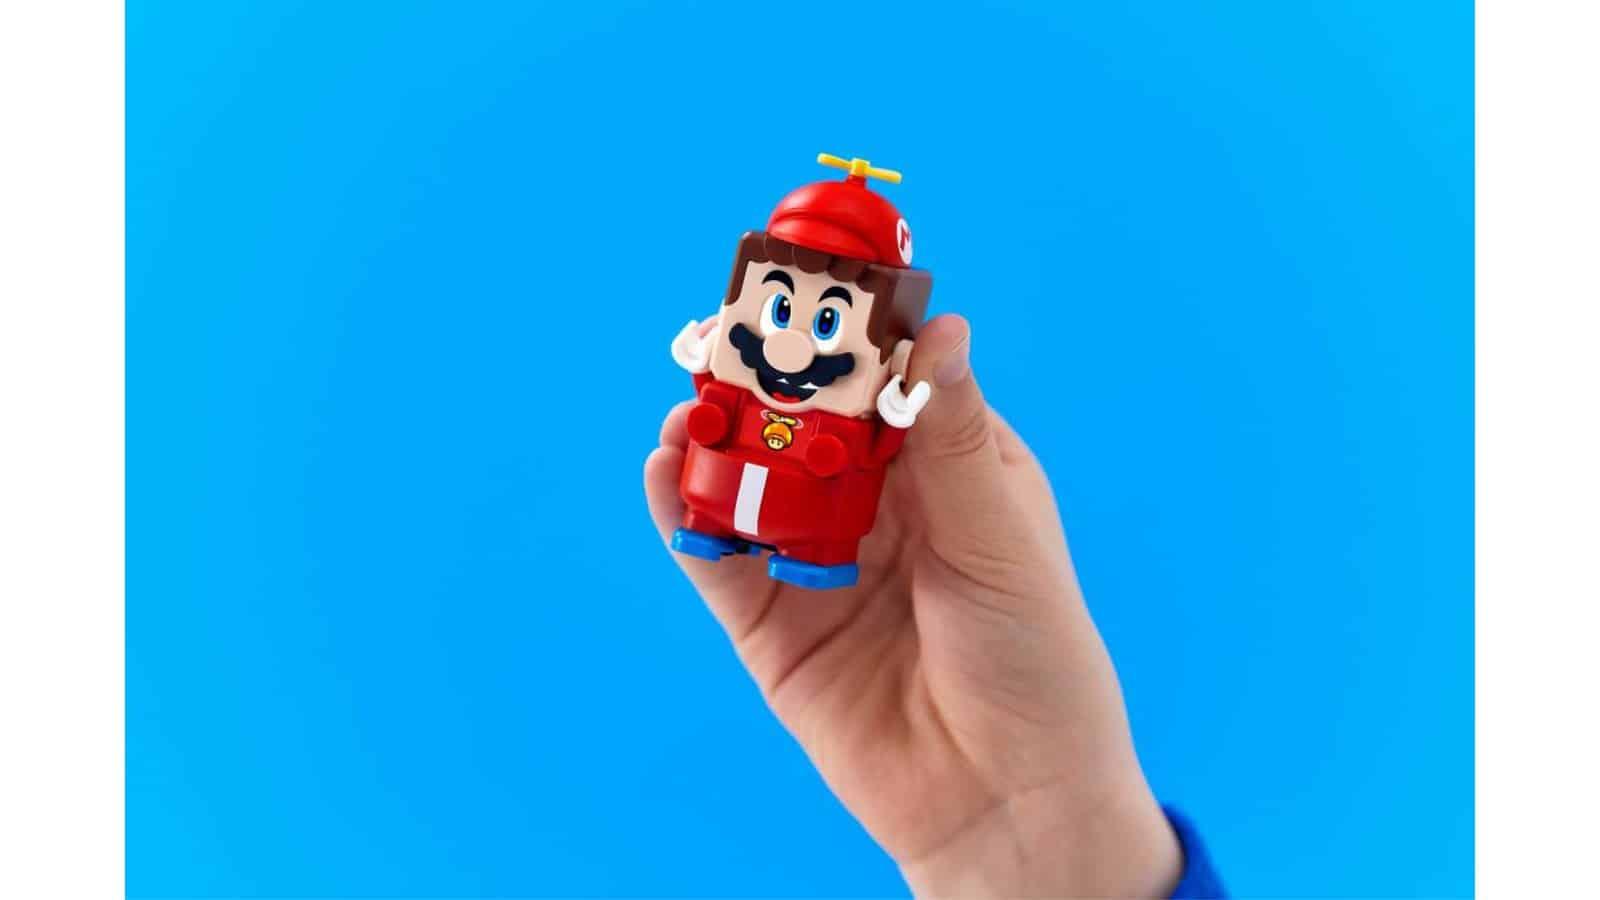 LEGO 71371 Propeller Mario Power-Up Pack - יד מחזיקה מריו